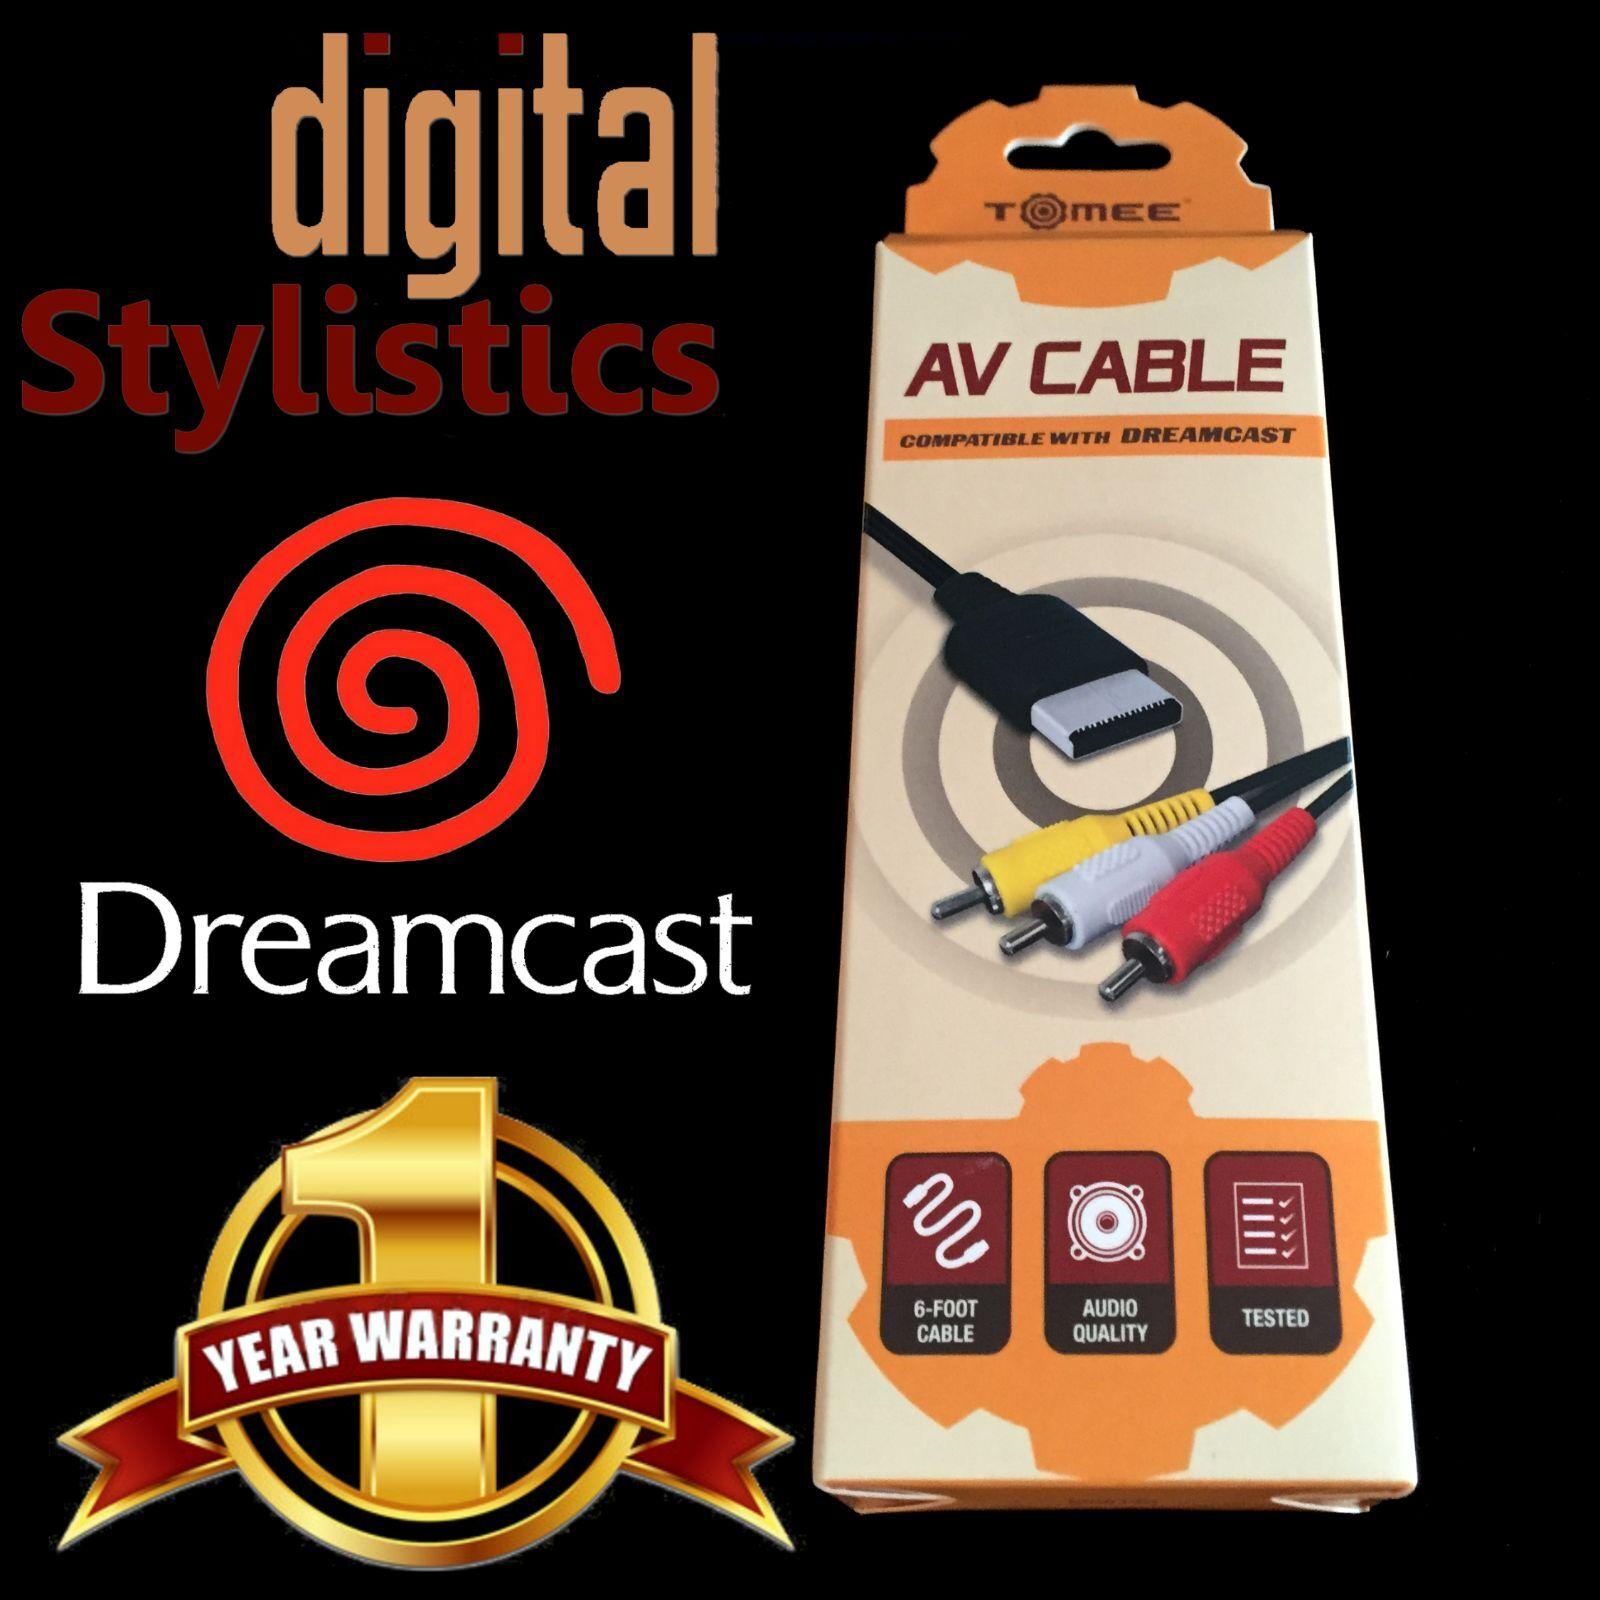 Купить Tomee DSI-M05140 - A/V Cable Cord (NEW) Sega Dreamcast (AV Audio Video) NIB Sealed Retail Packaging